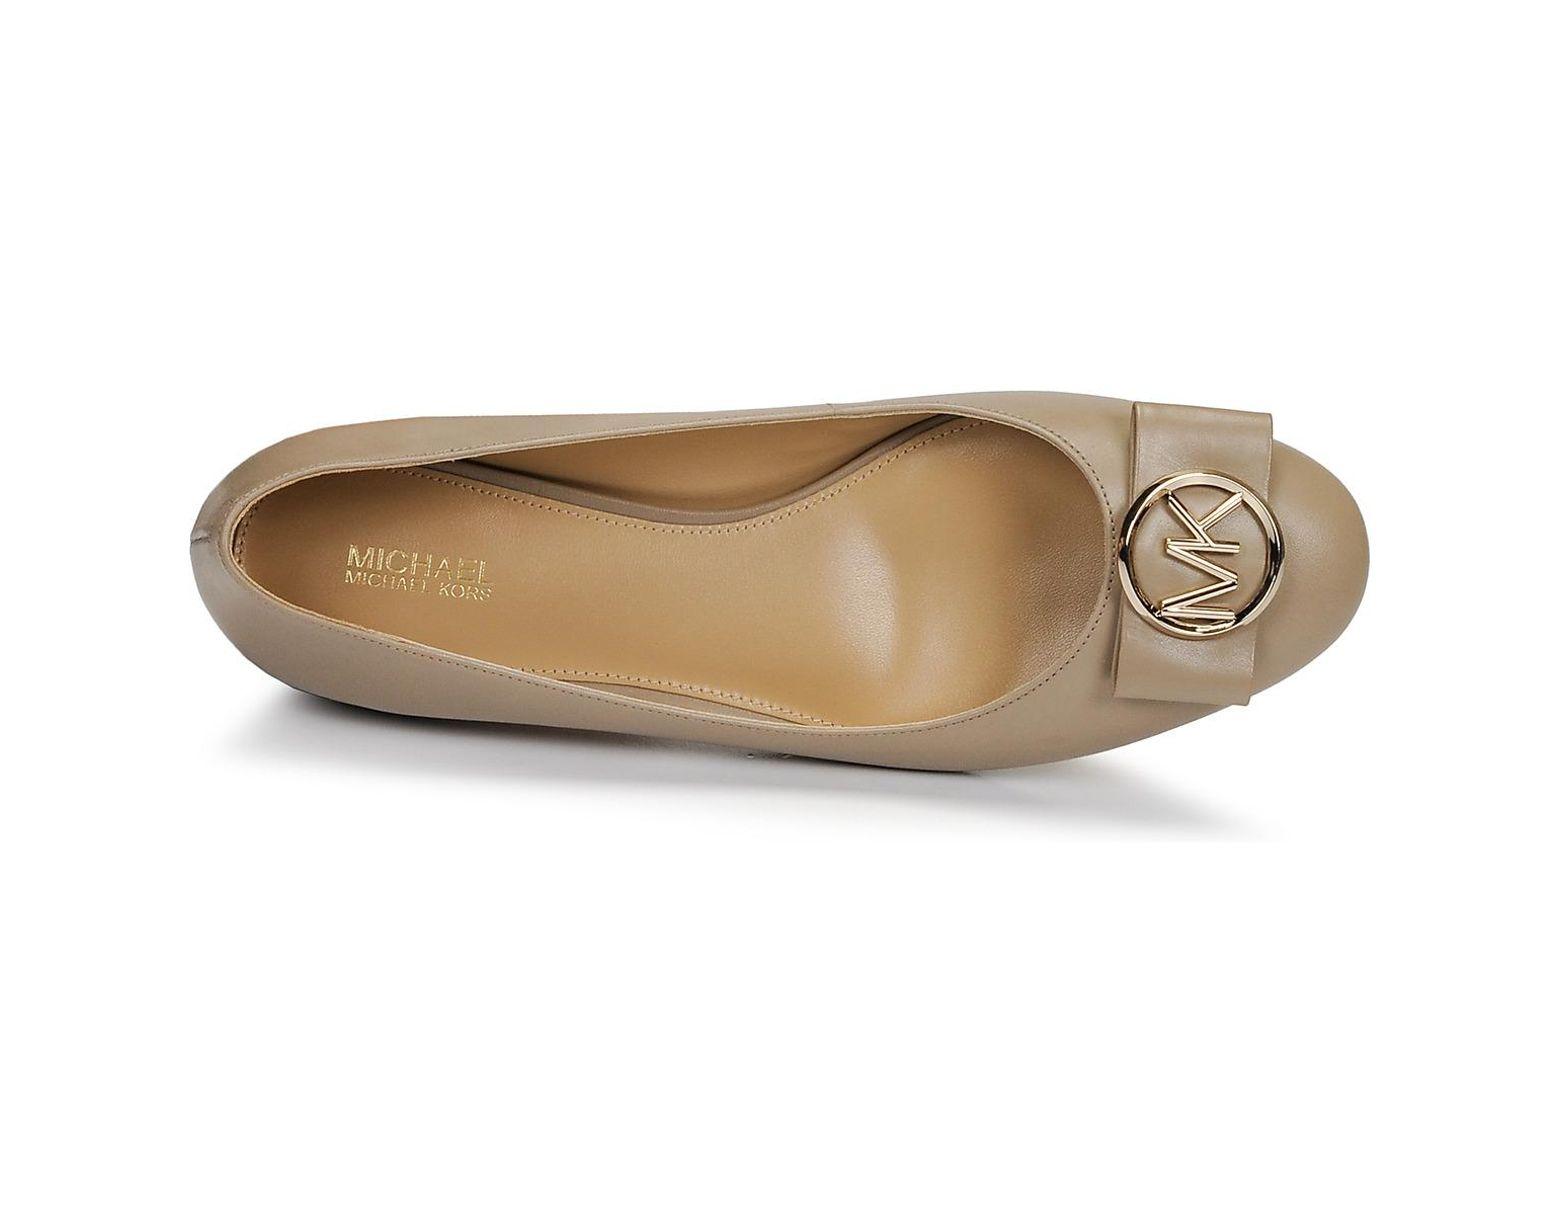 71735affb MICHAEL Michael Kors Marsha Women's Shoes (pumps / Ballerinas) In Beige in  Natural - Lyst